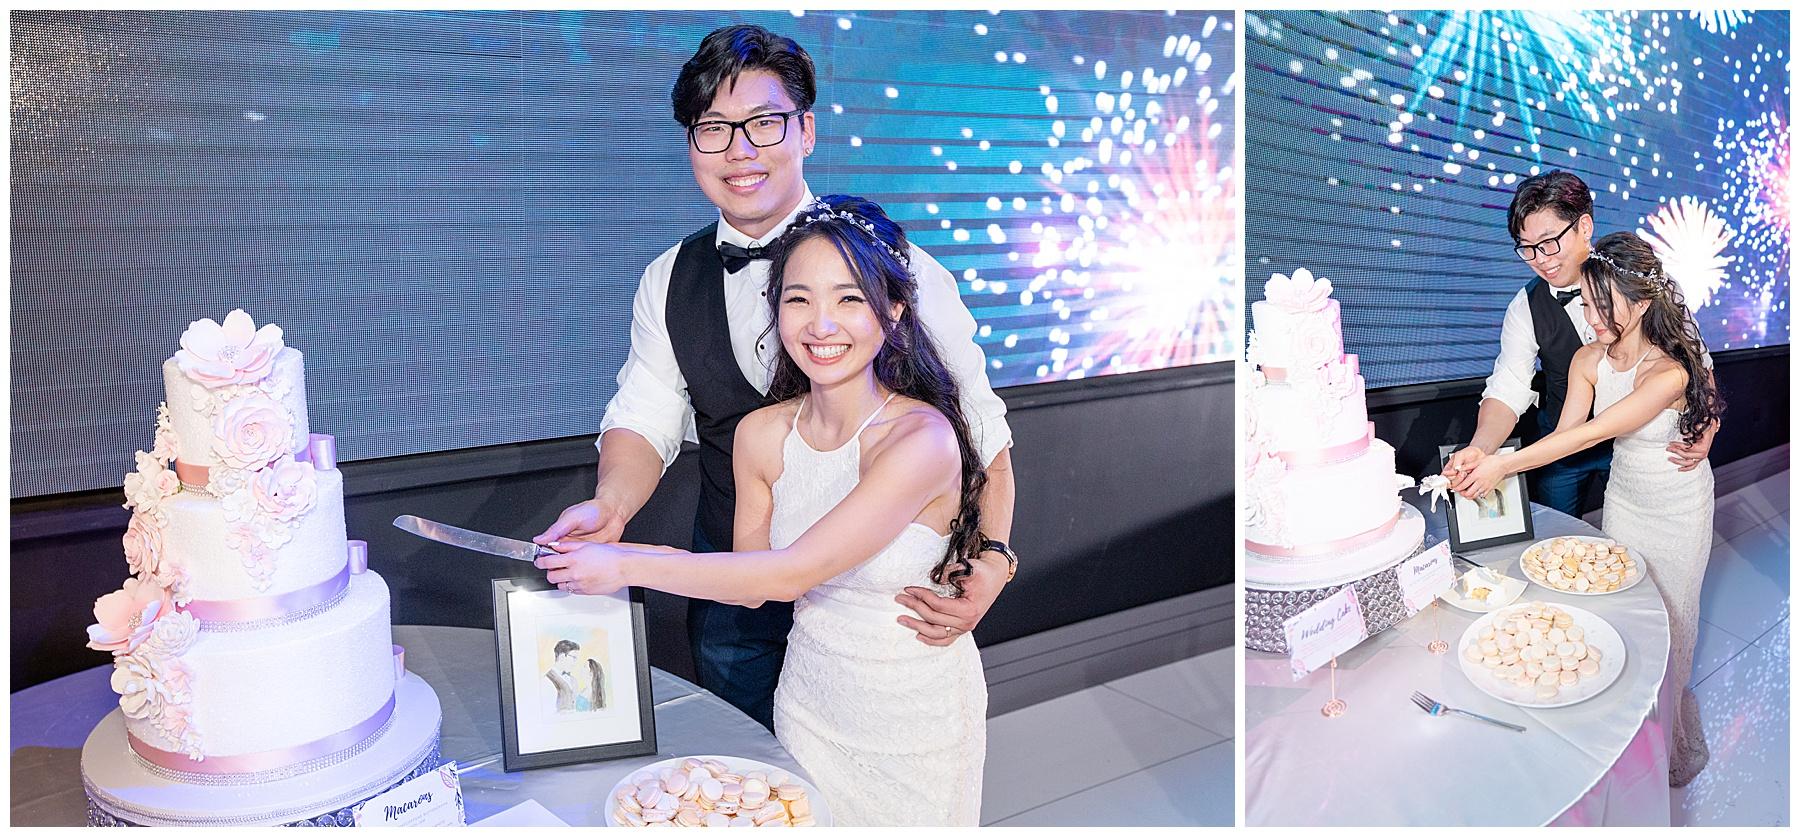 la banquets legacy ballroom cake cutting